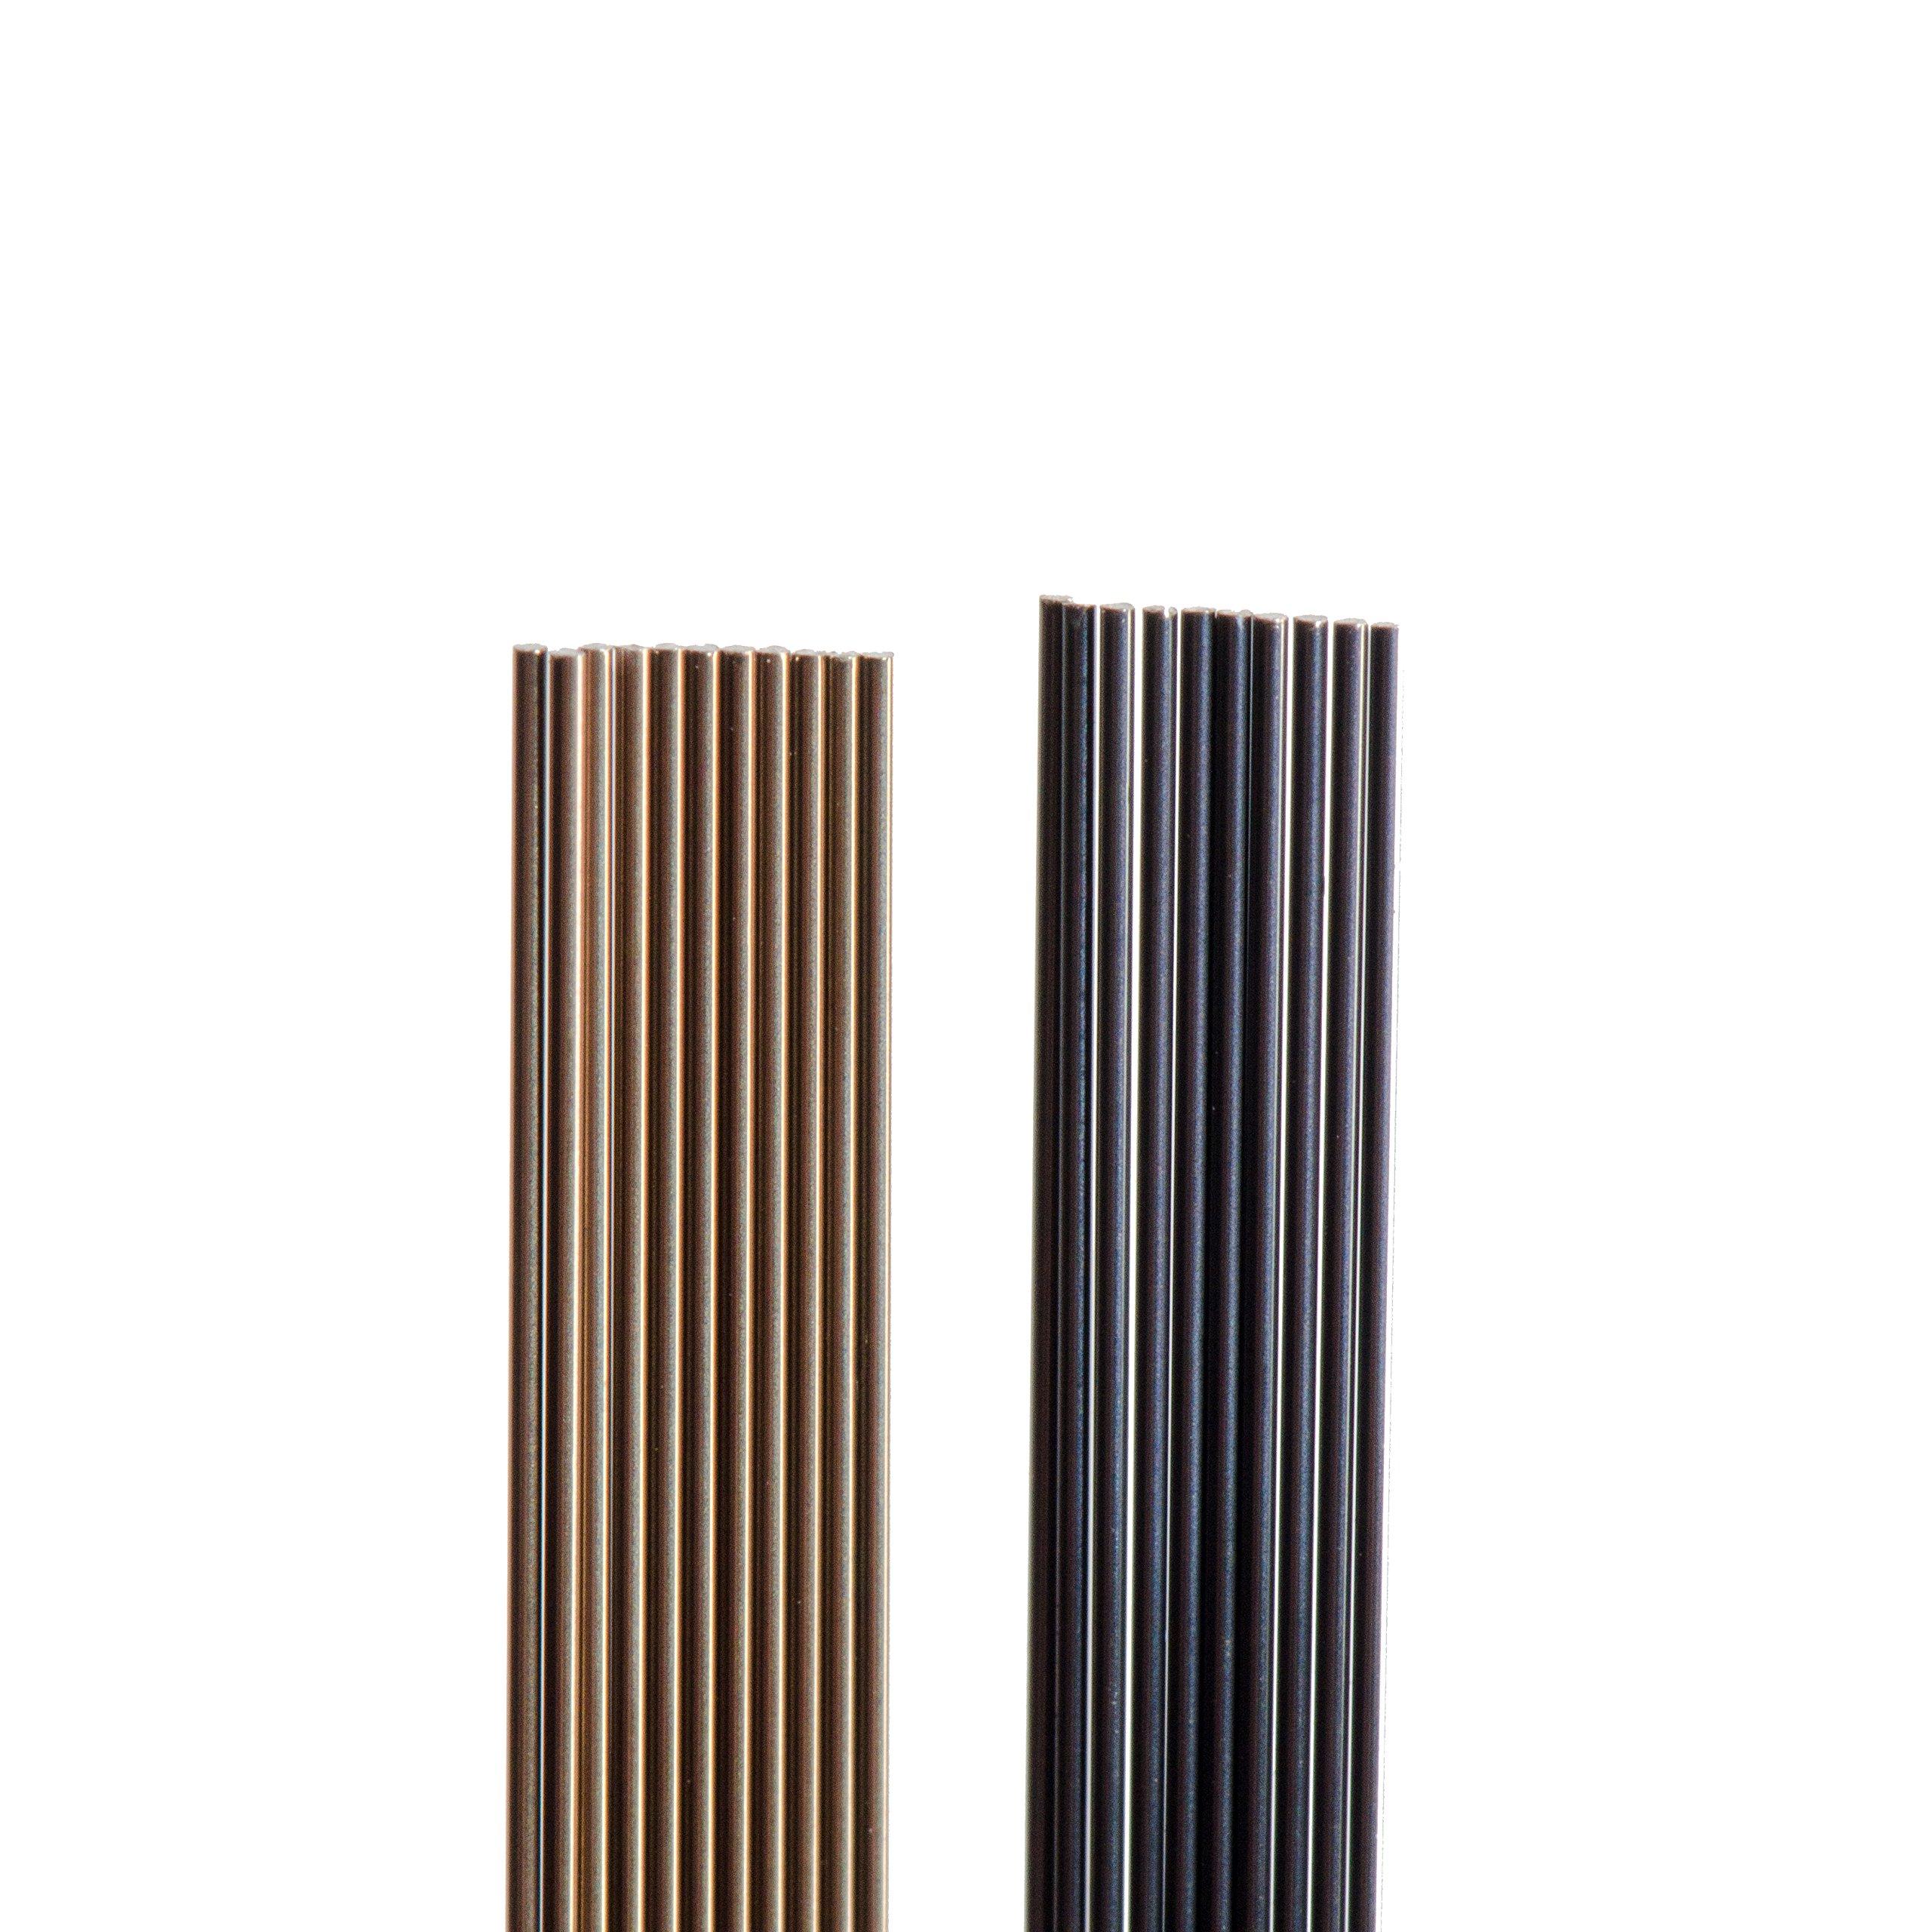 Nitinol #1 Wire, Oxide Finish, Super Elastic Temper, 0.009'' Diameter, 72'' Length